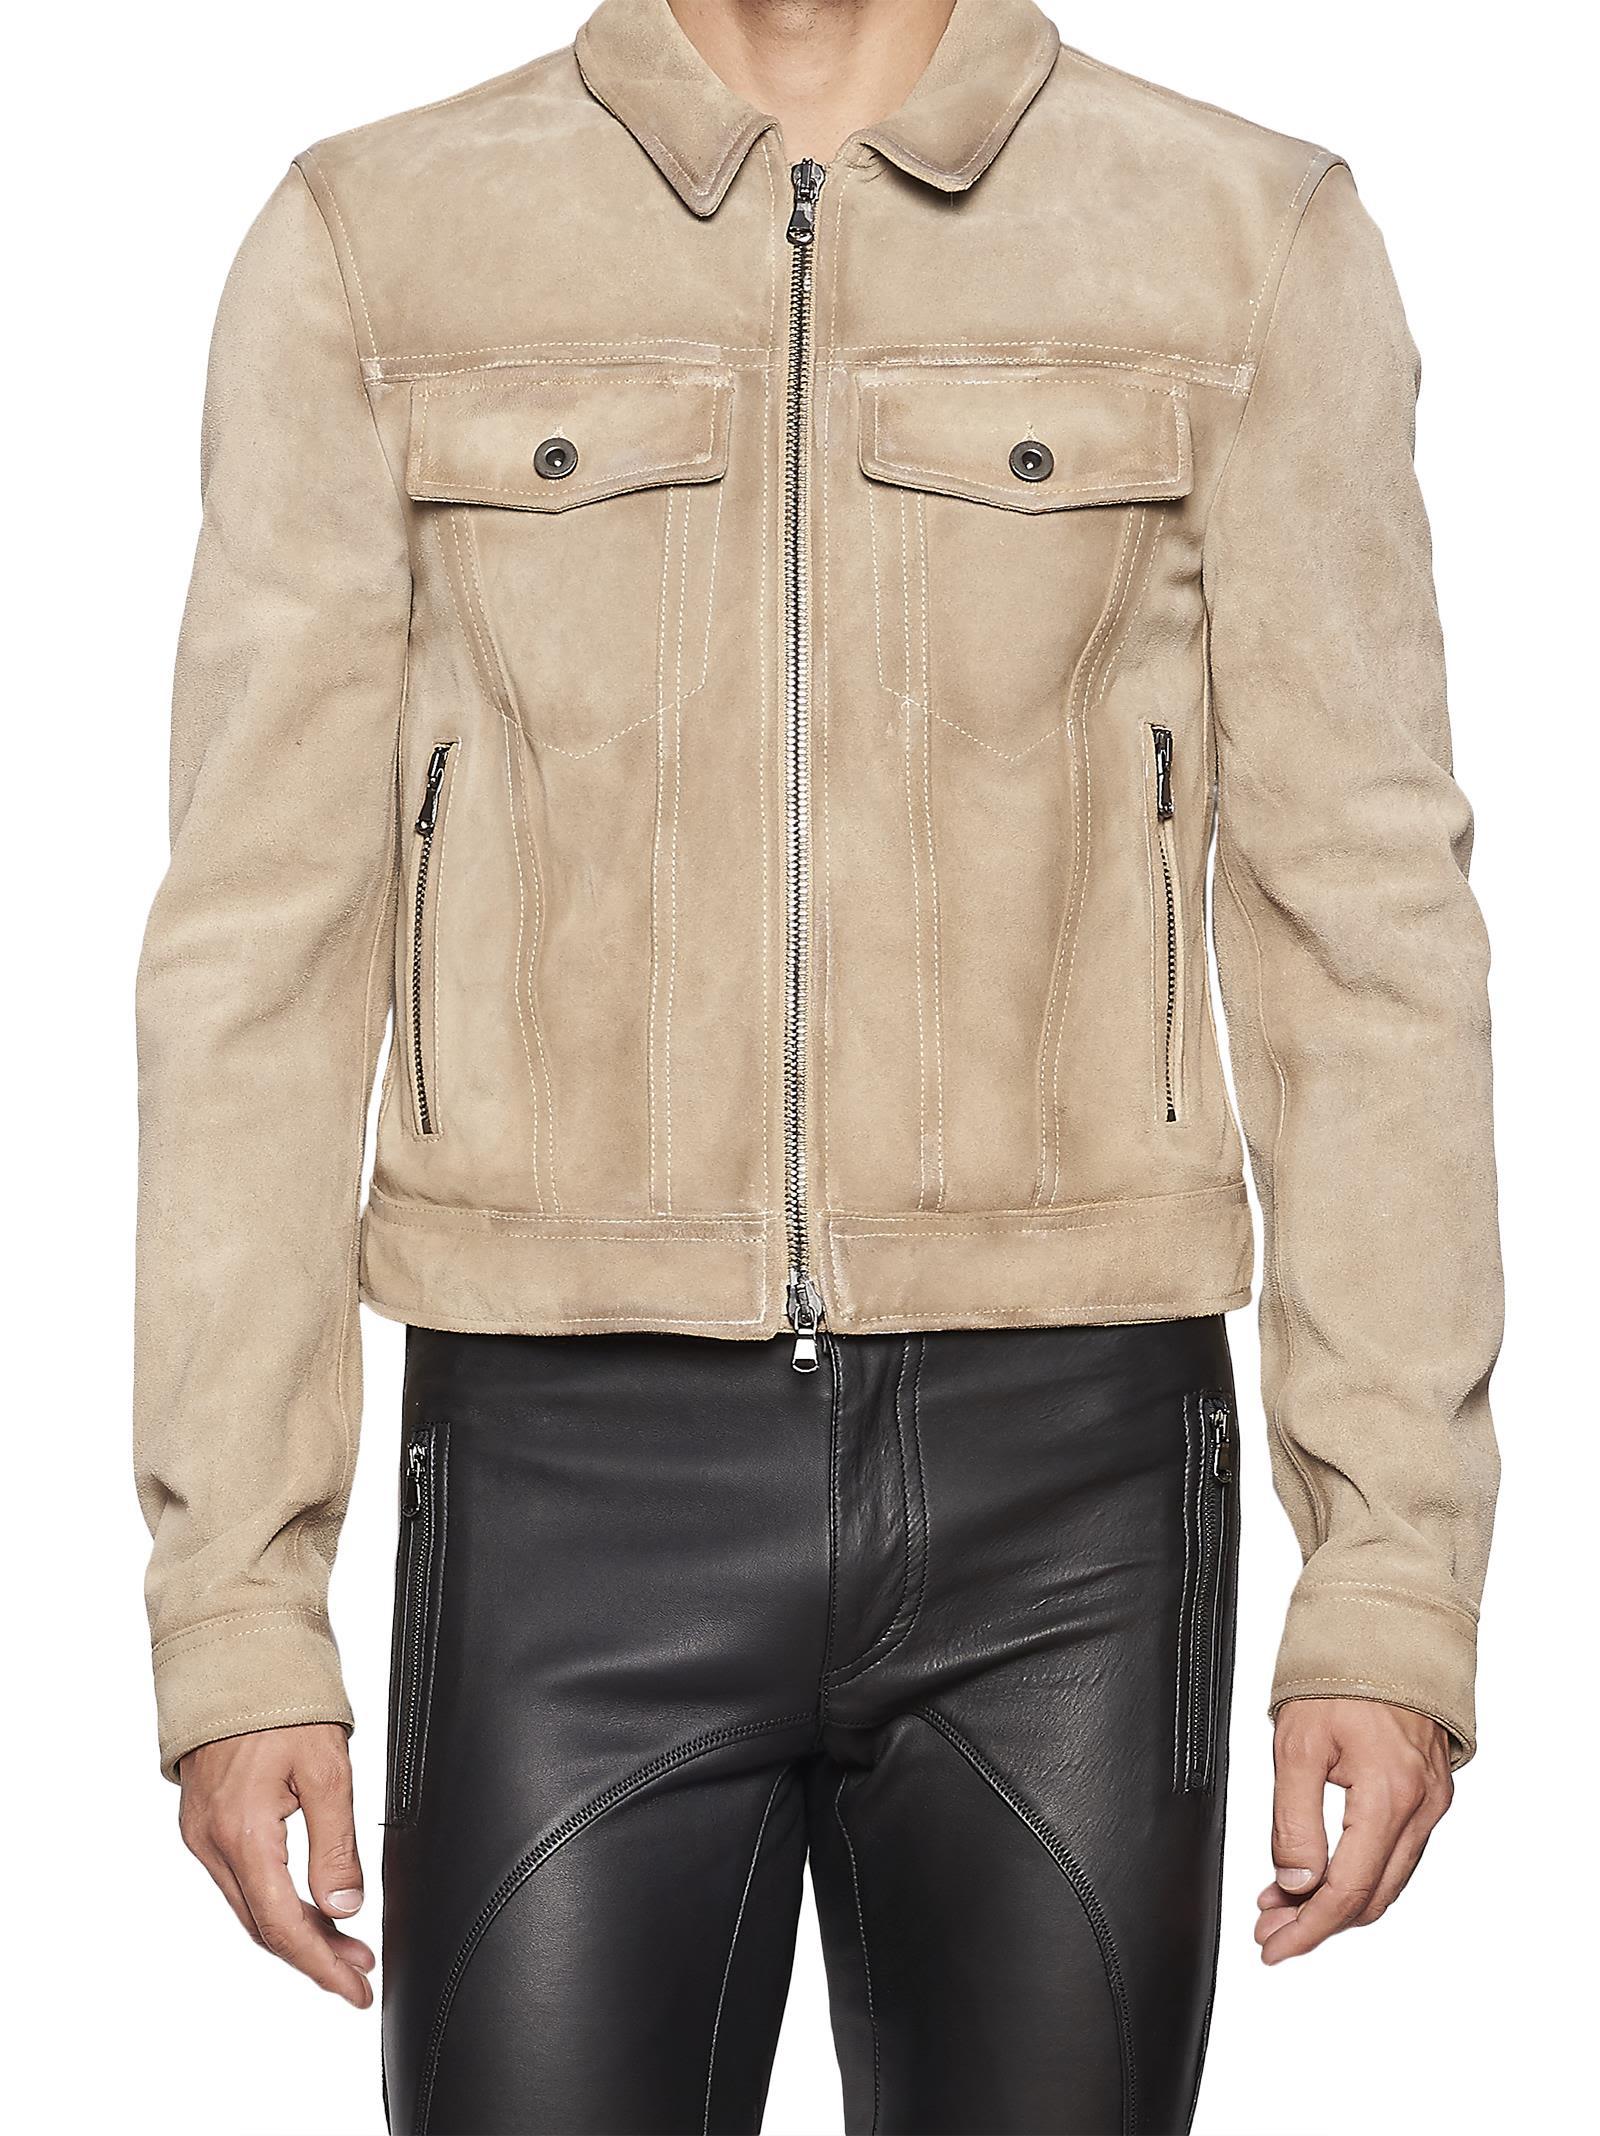 Diesel Black Gold Lavenere Jacket